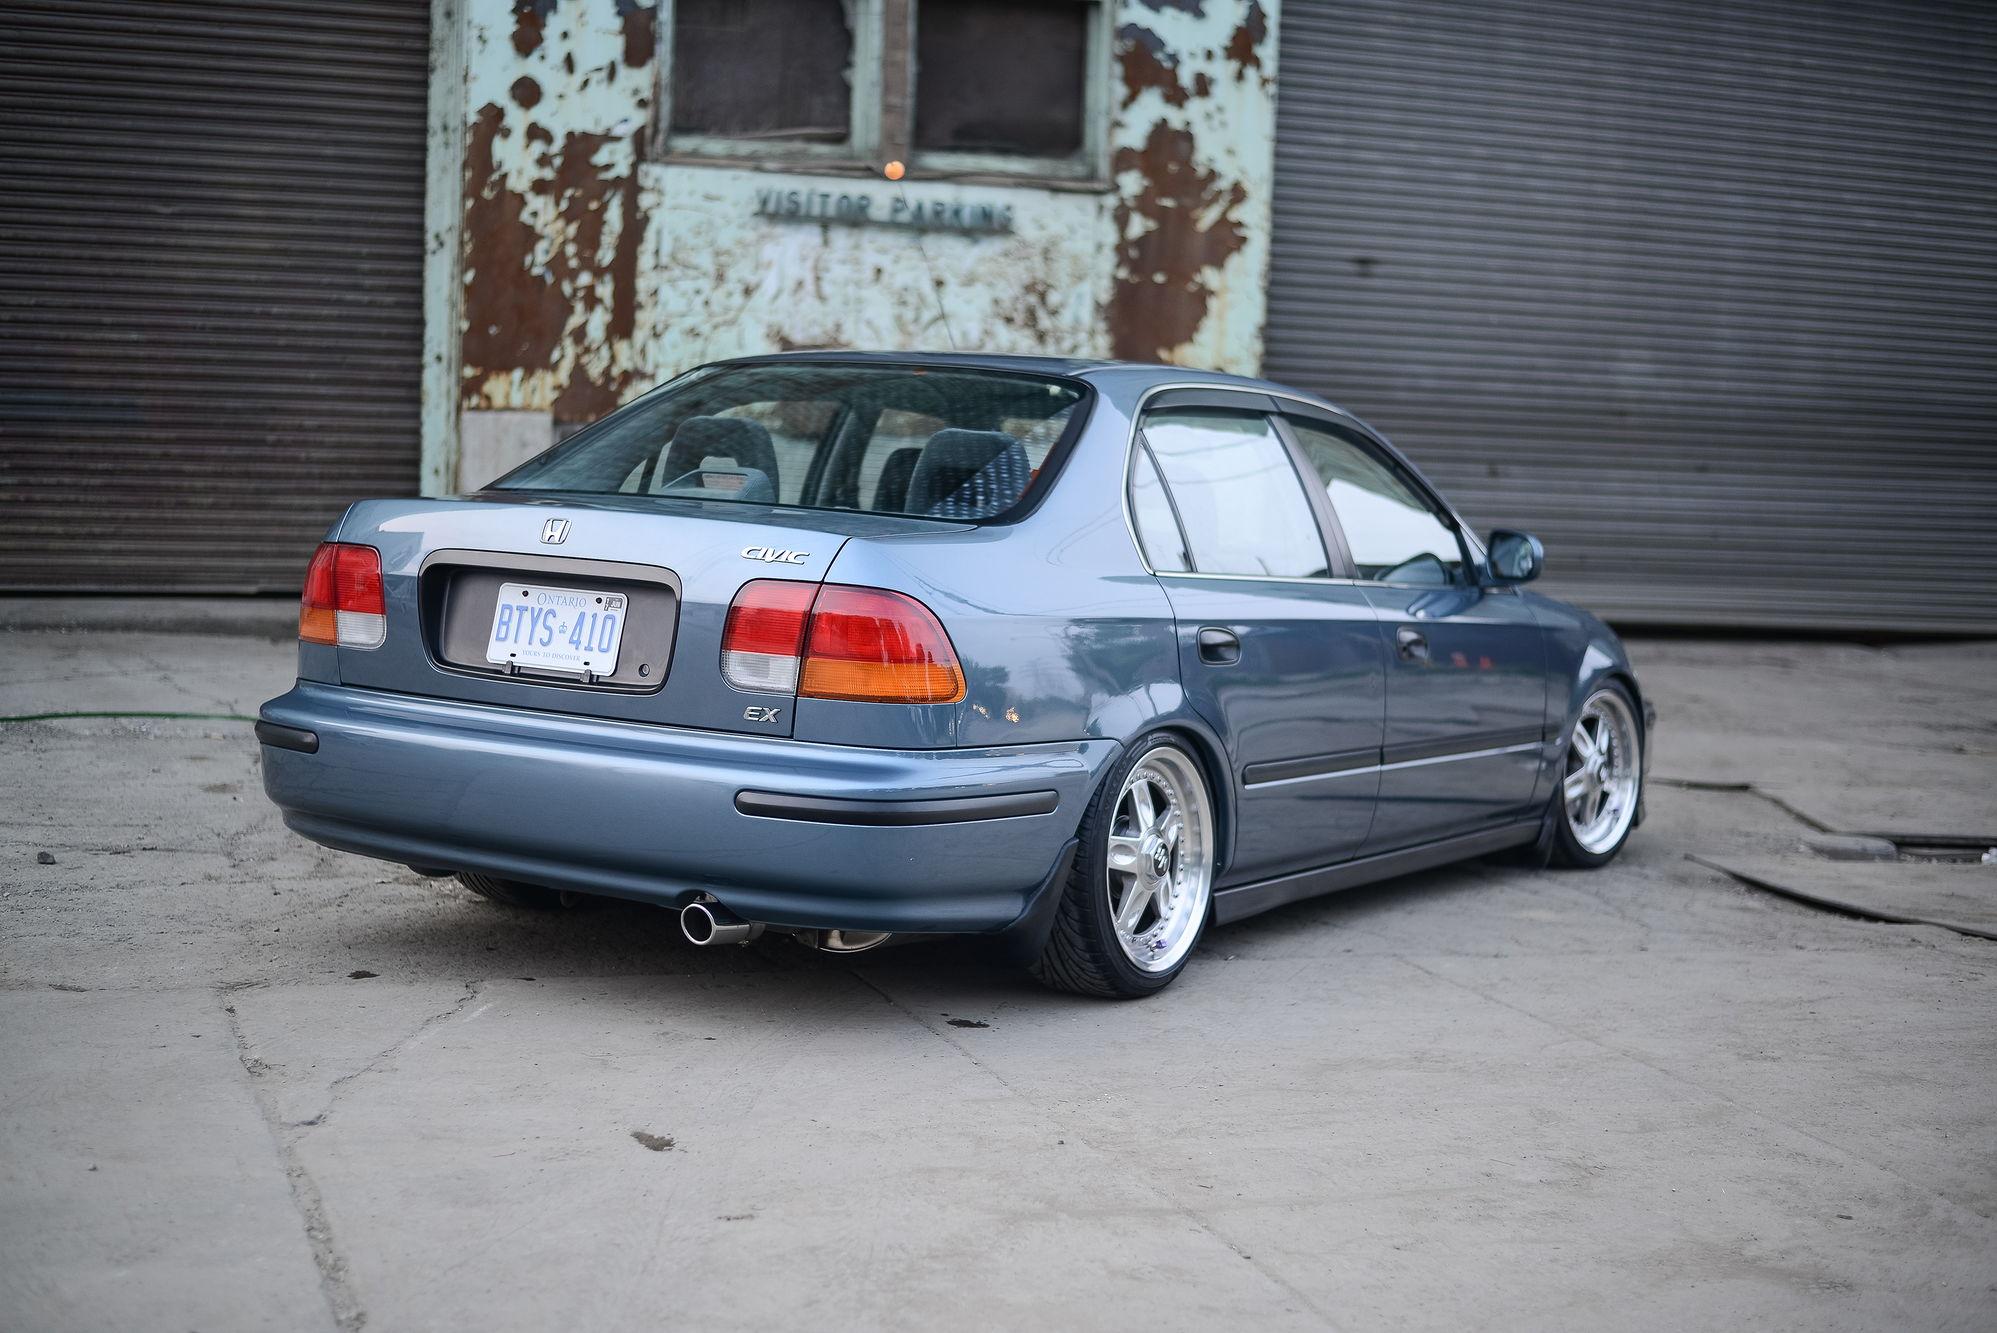 Hawk Brake Pads >> CA JDM 1996 Honda Civic EX - EK4 Build - $6000 - San Francisco, CA - Honda-Tech